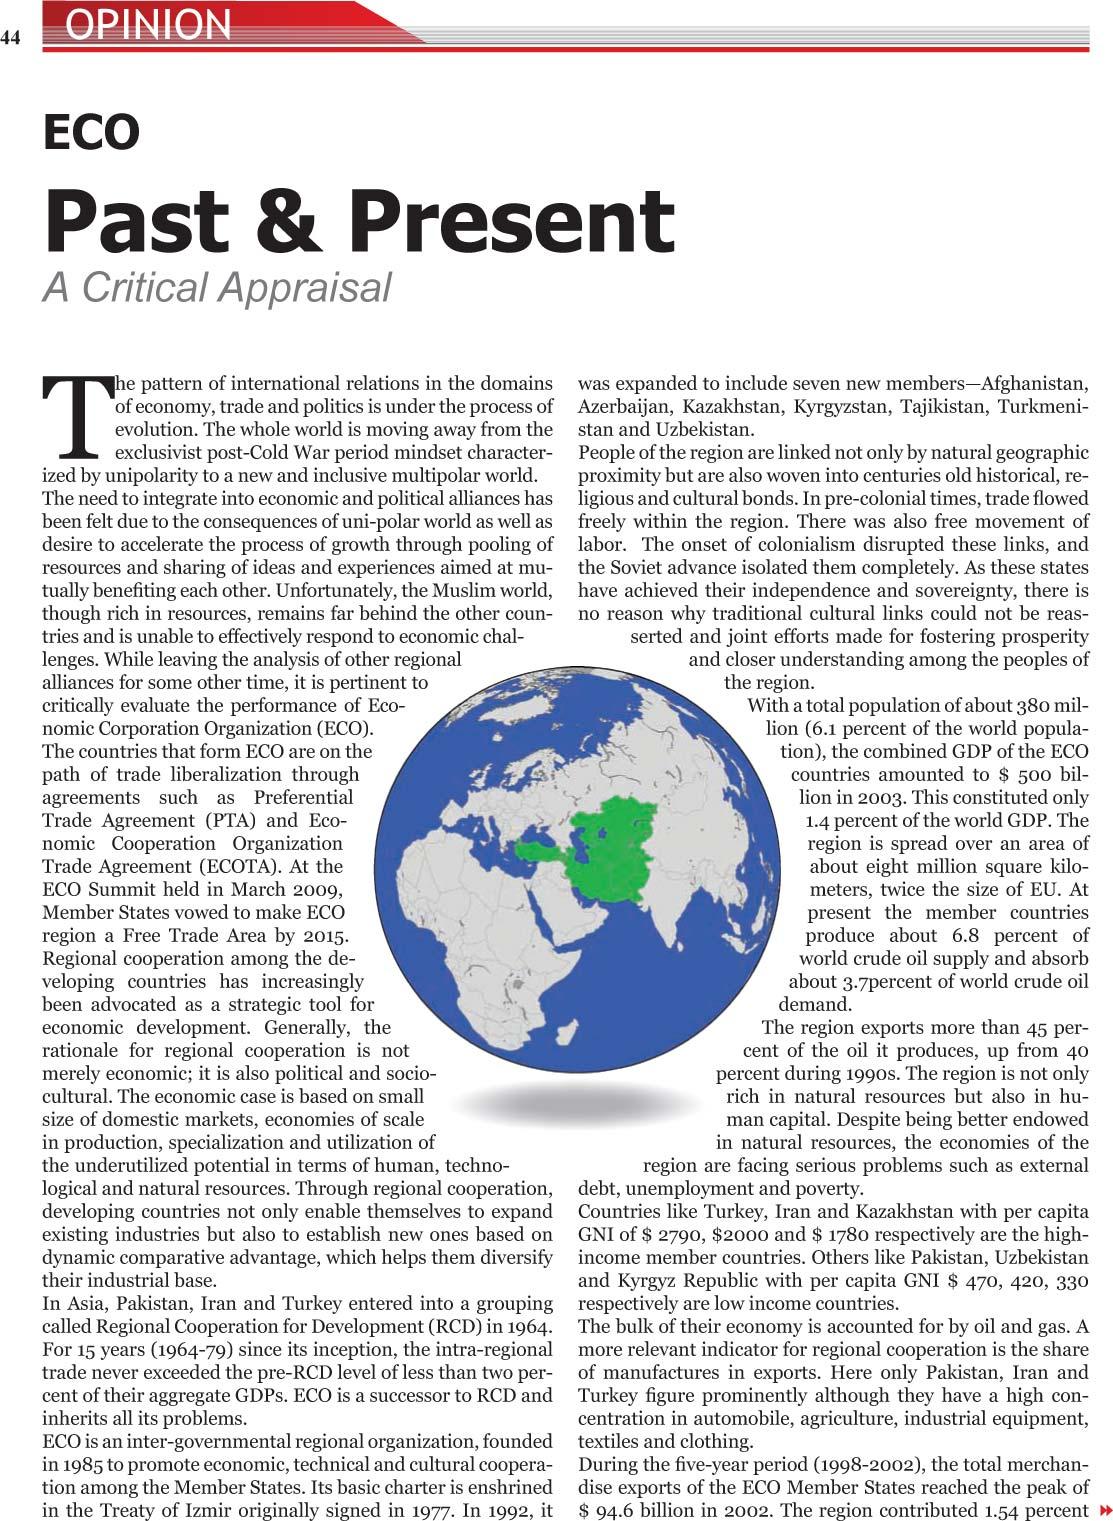 تحریک منہاج القرآن Minhaj-ul-Quran  Print Media Coverage پرنٹ میڈیا کوریج Monthaly ECO Times July 2009